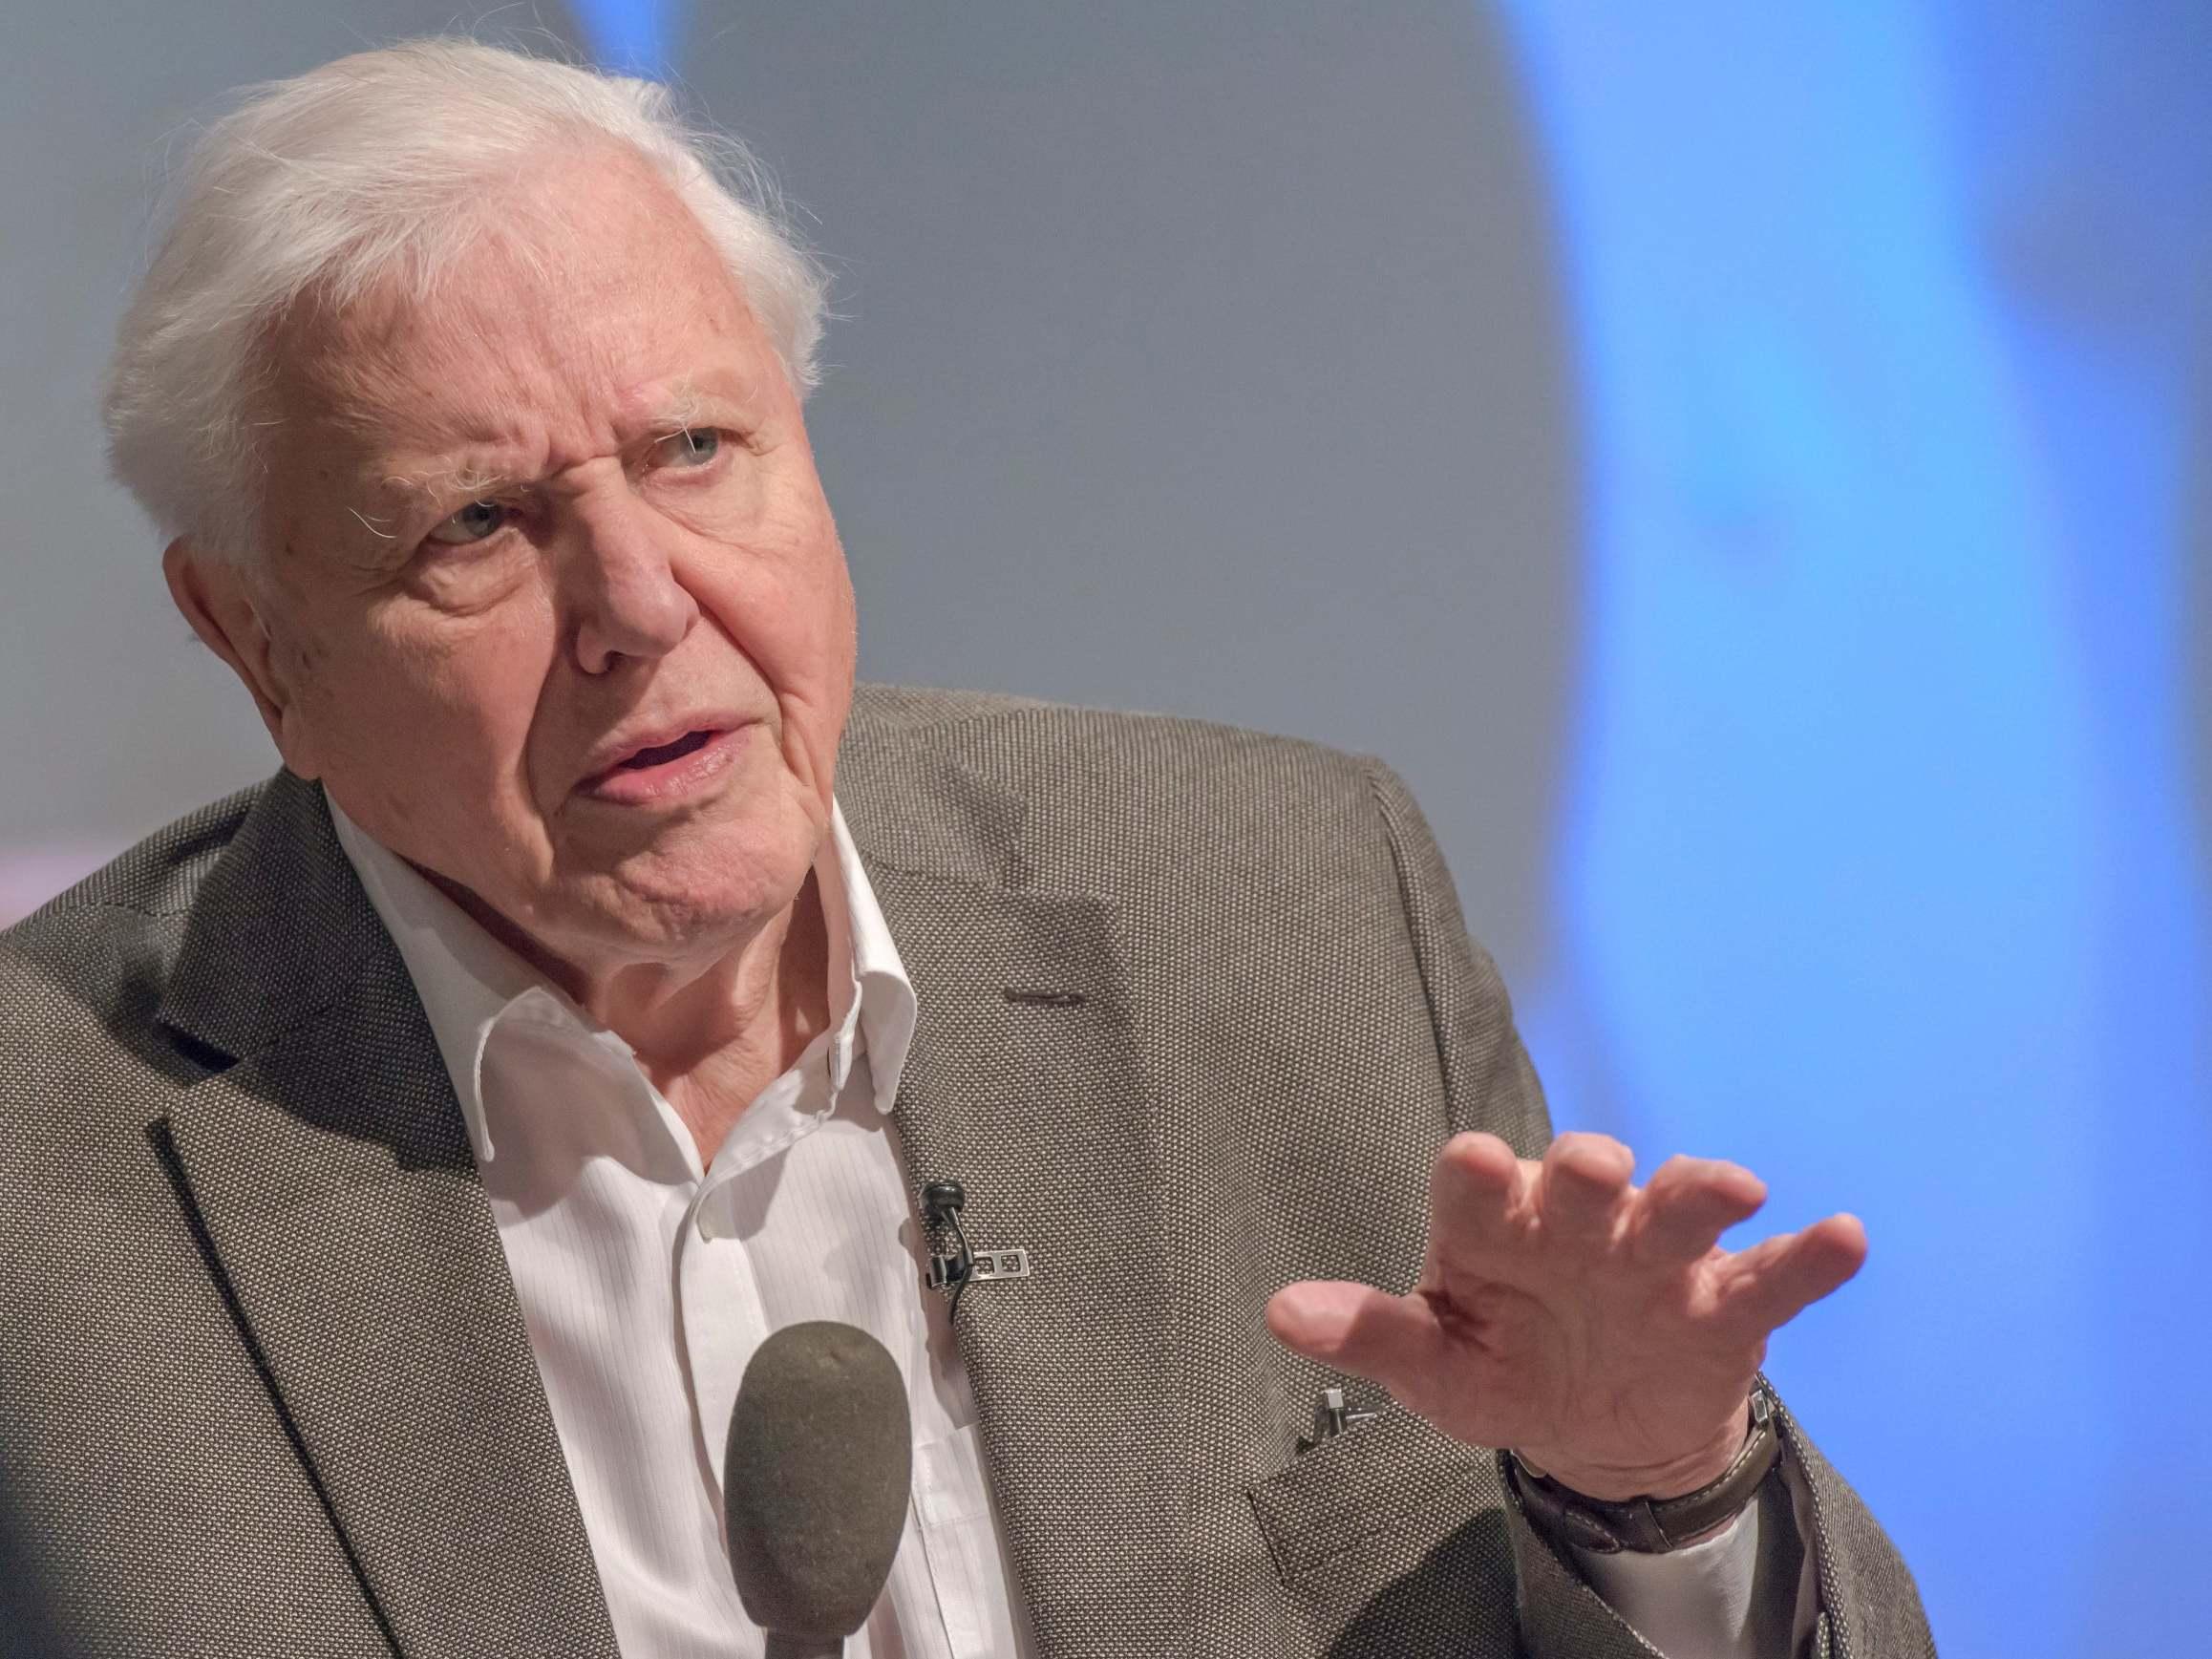 David Attenborough says fixed-term parliaments could mean short-sigh…